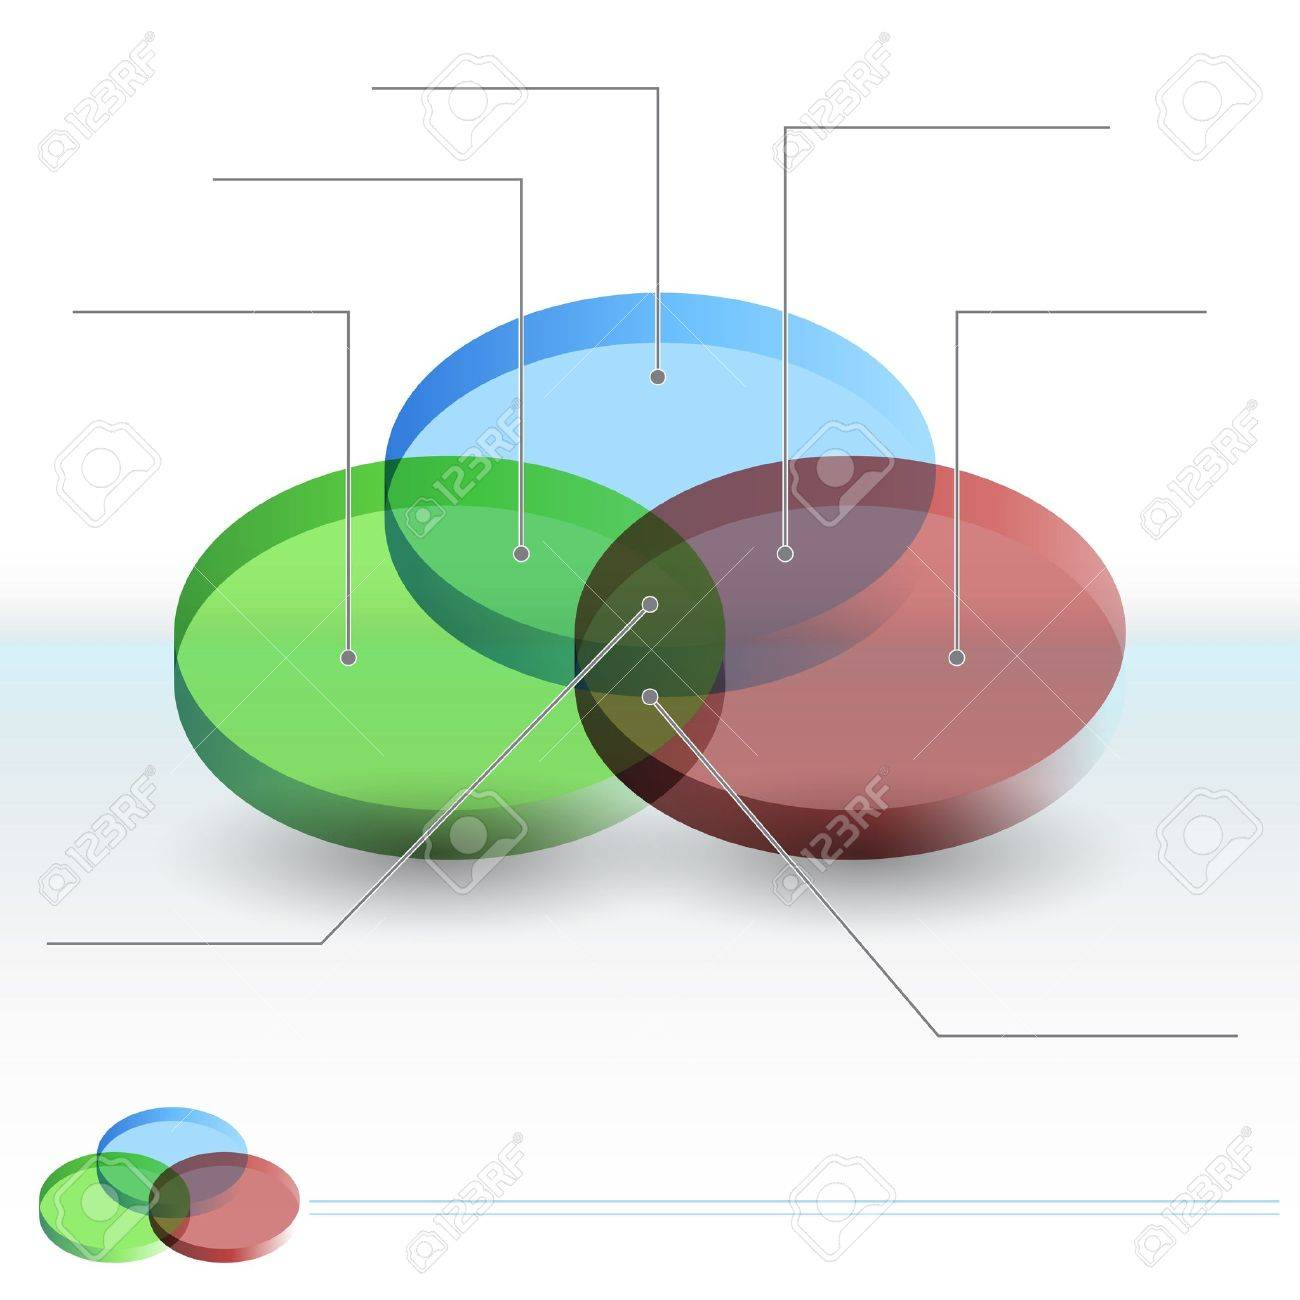 an image of a 3d venn diagram sections chart  stock vector - 14770191